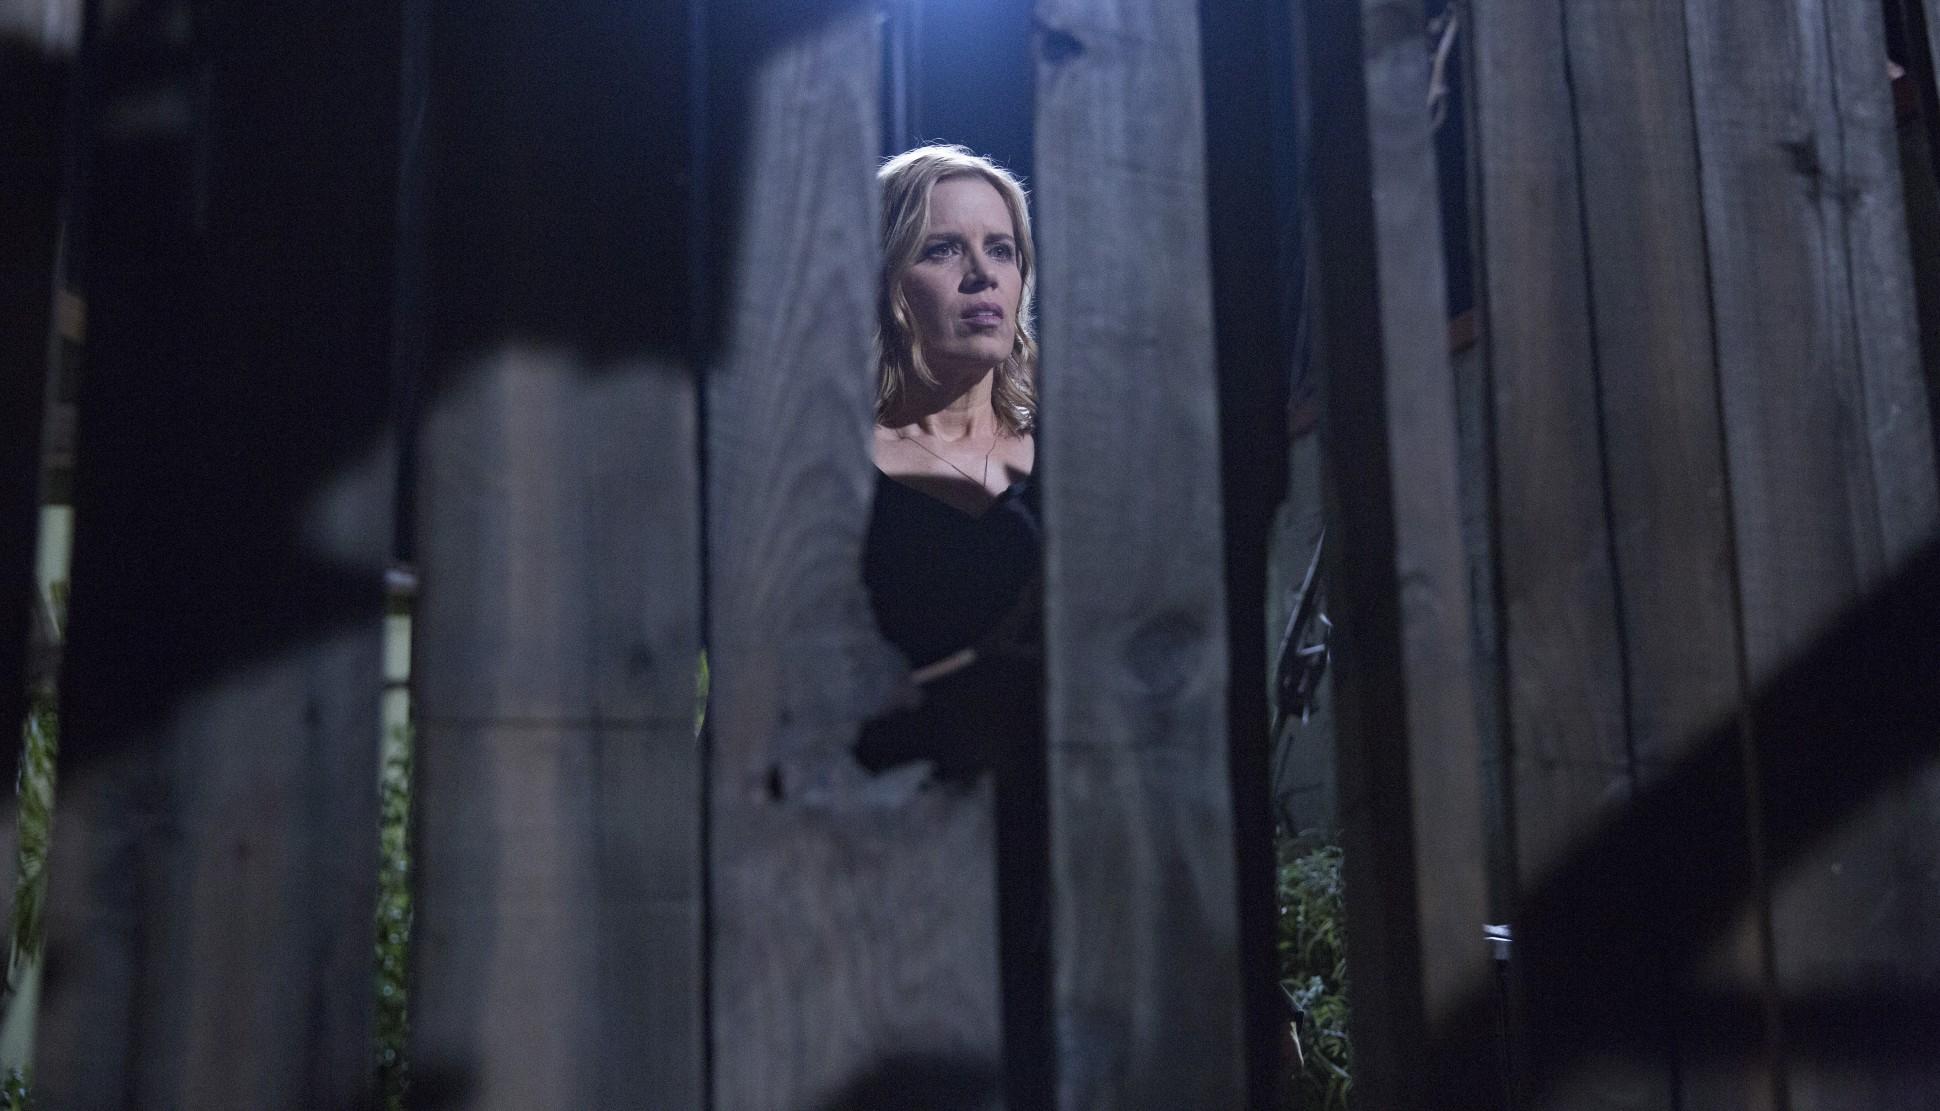 Fear the Walking Dead season 1, episode 3: How the show borrows from Battlestar Galactica